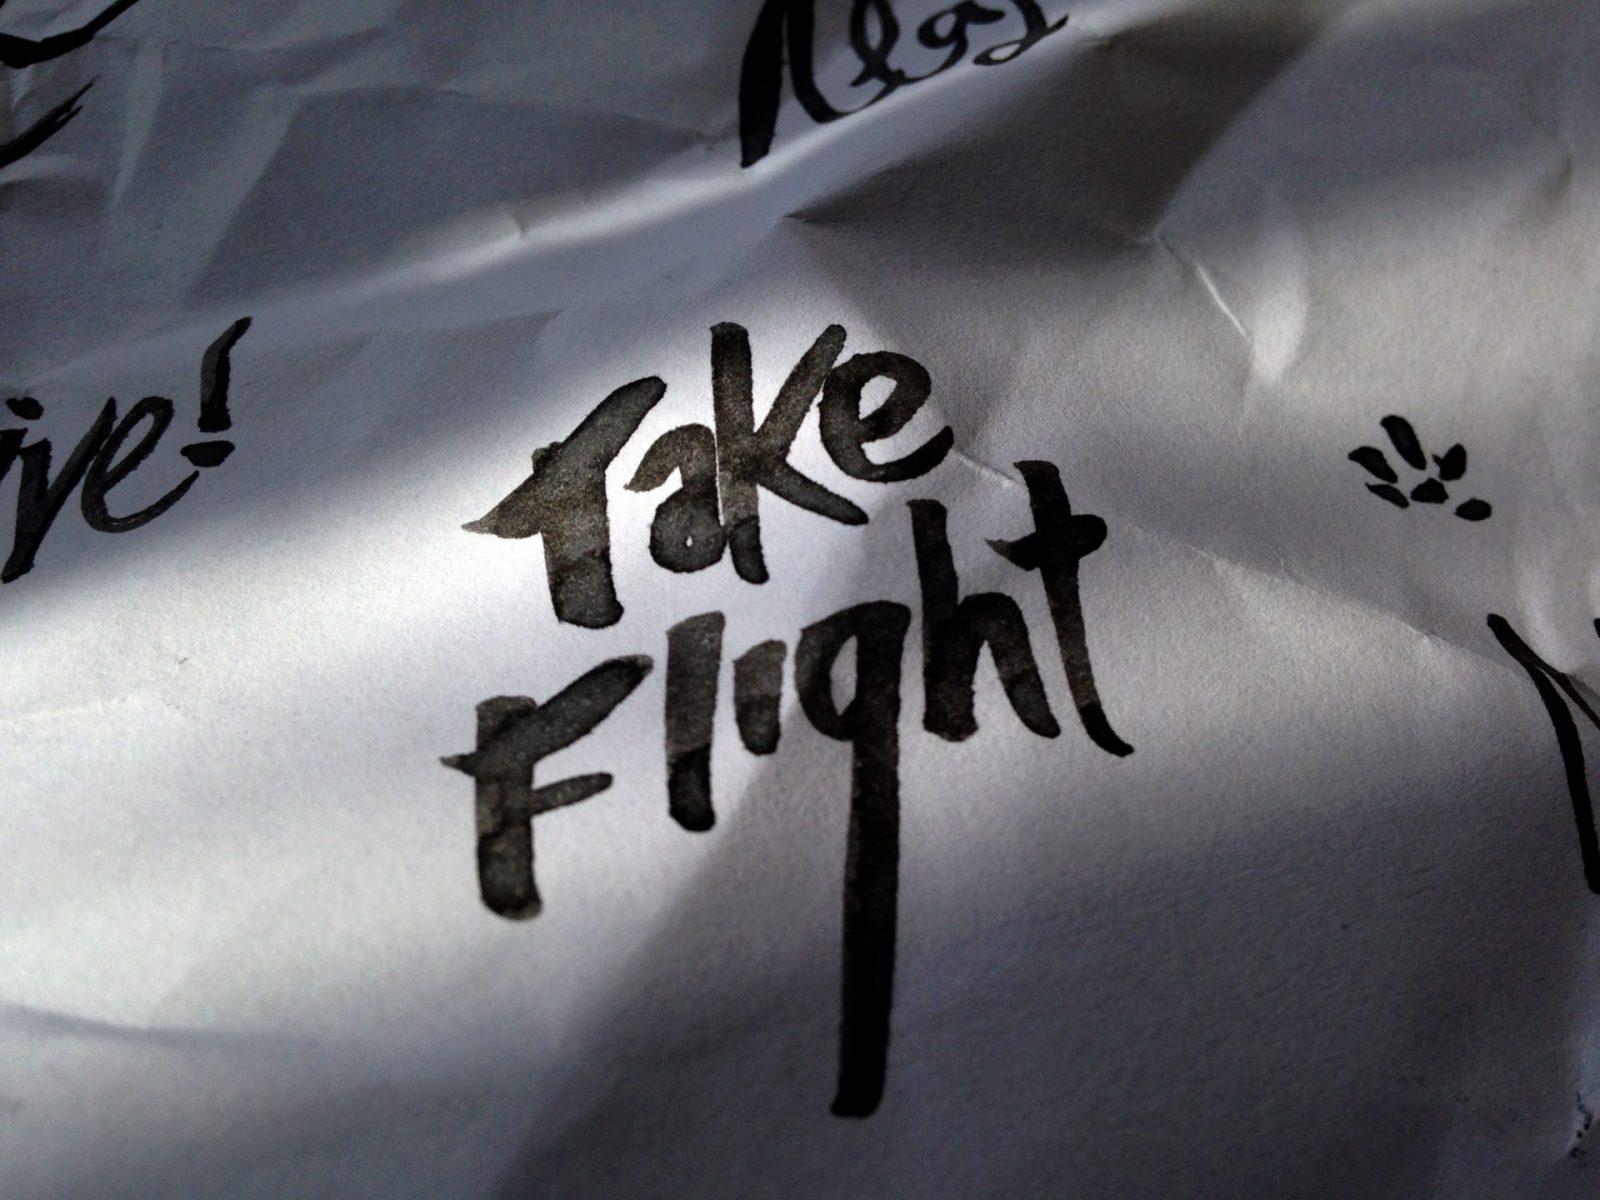 TakeFlight1